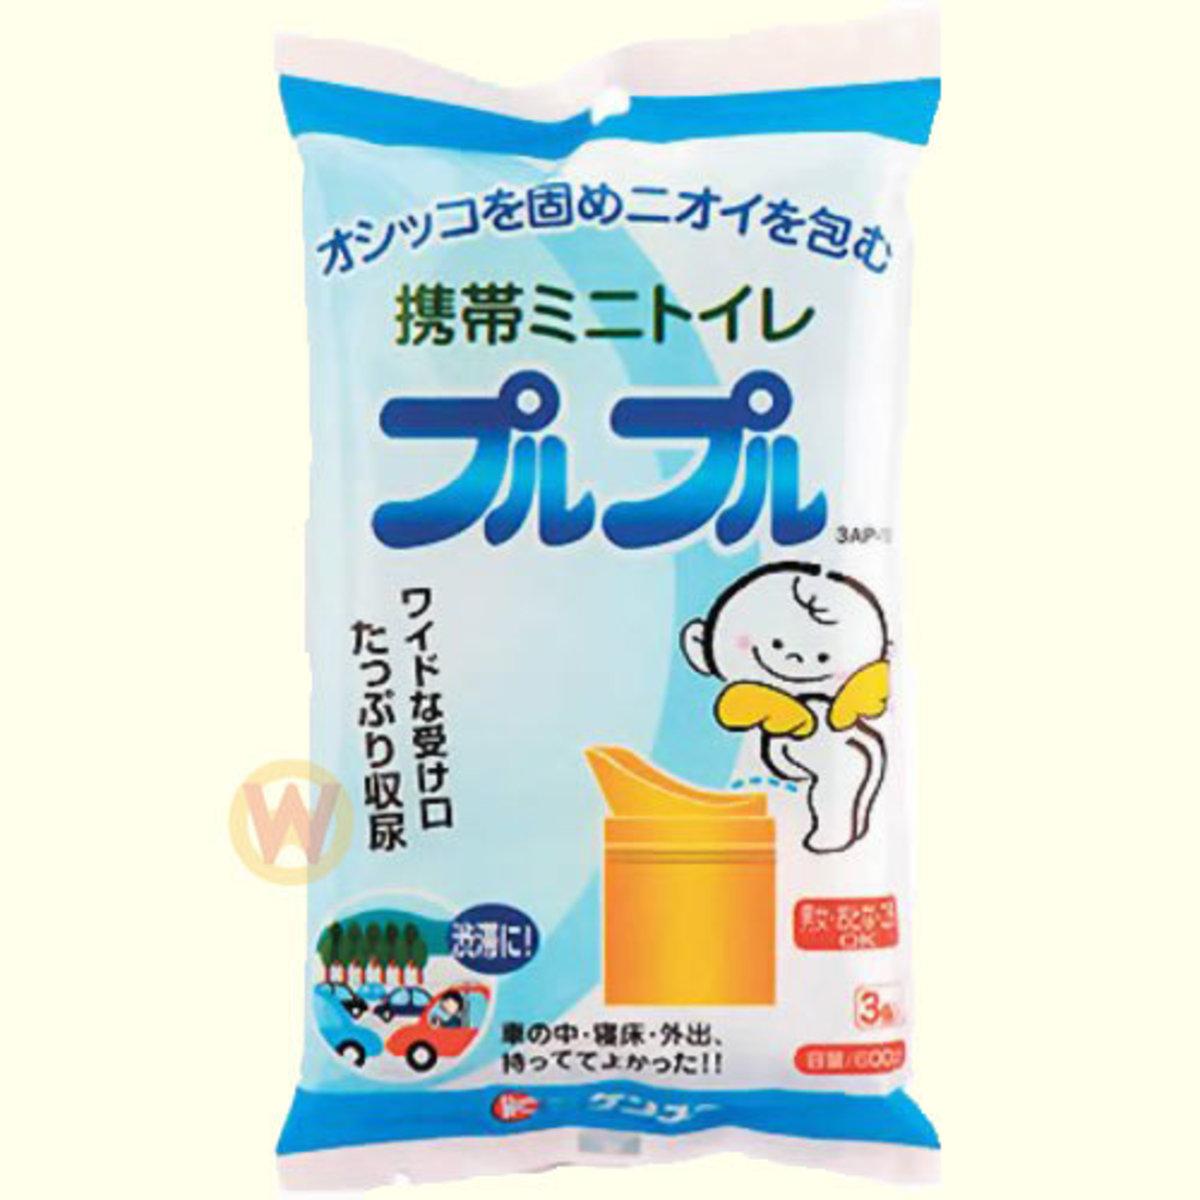 KENYUU MINI PORTABLE TOLIET 3SETS [Parallel Import Product]